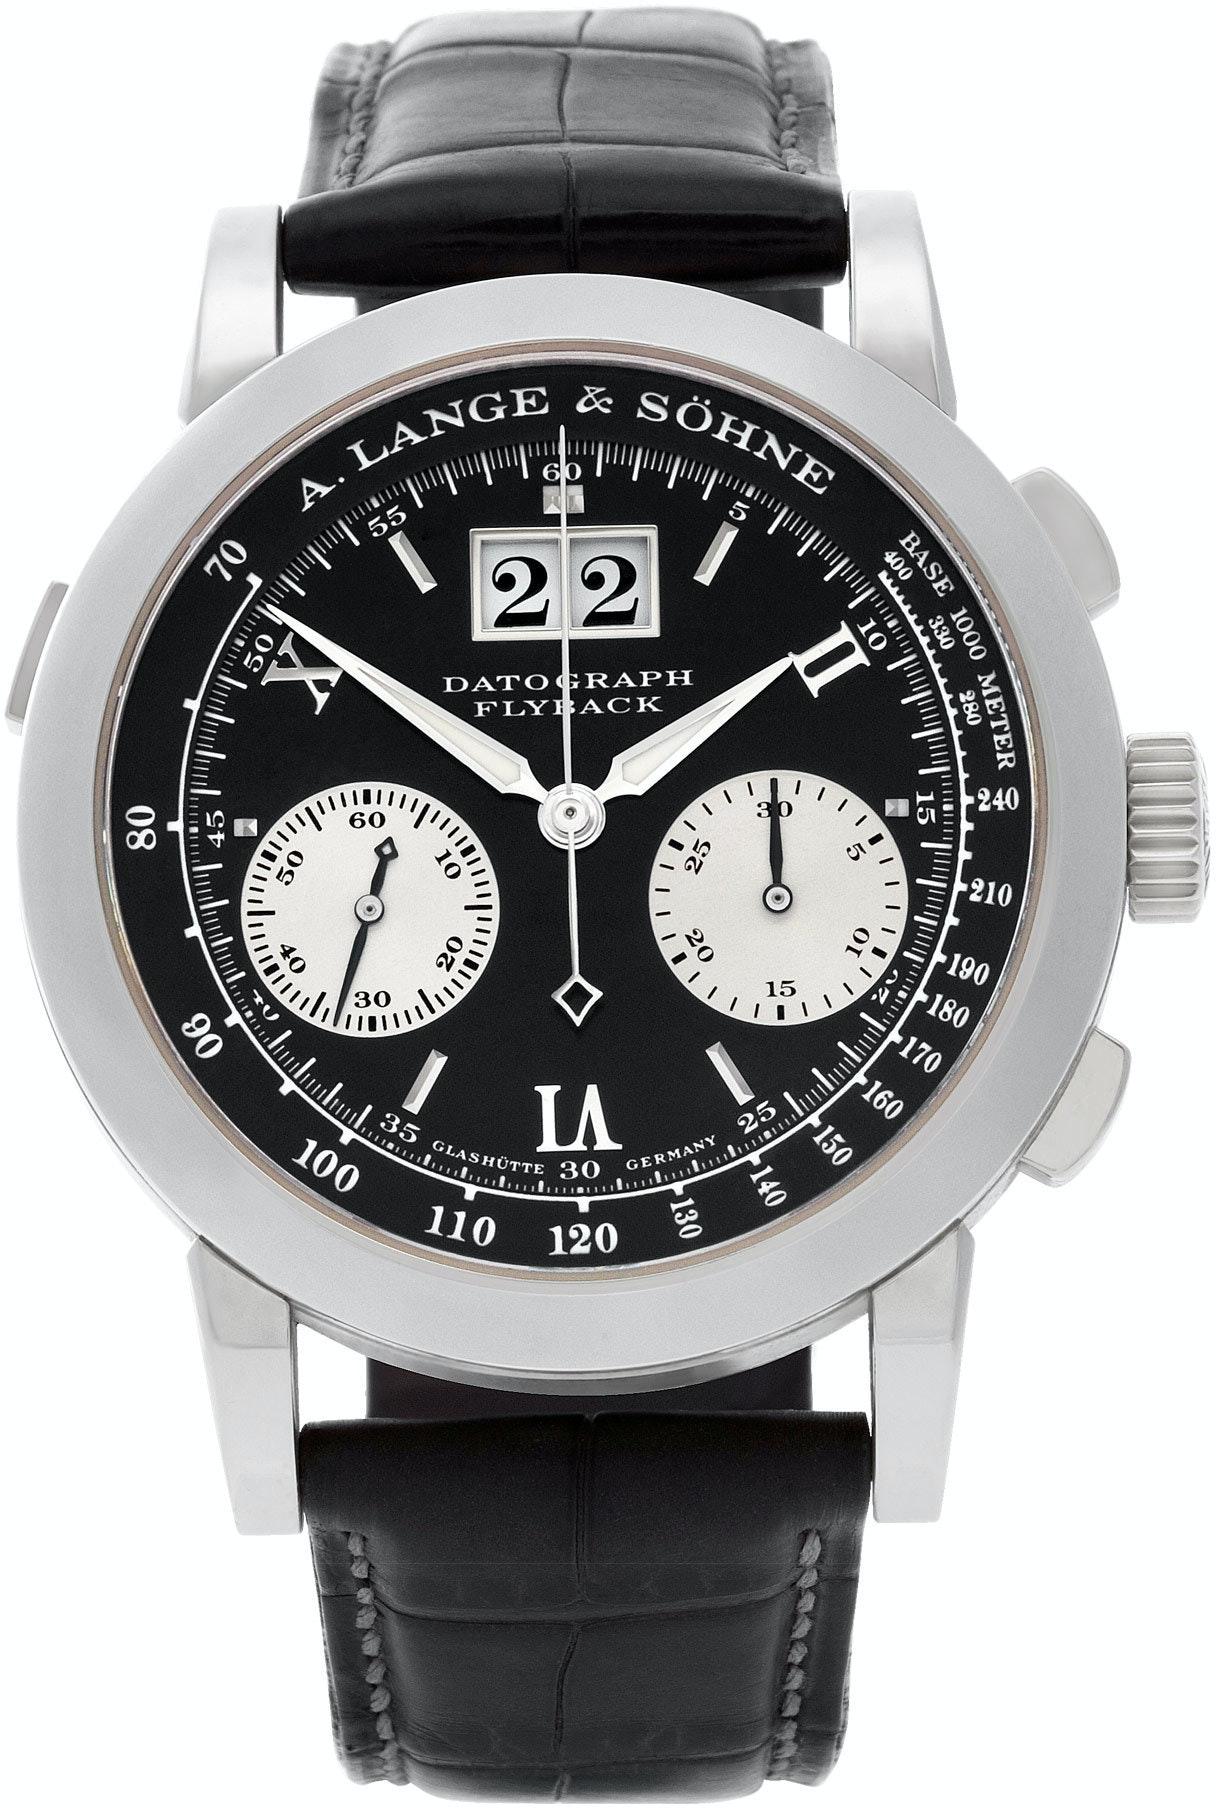 A. Lange & Sohne Datograph 403.035